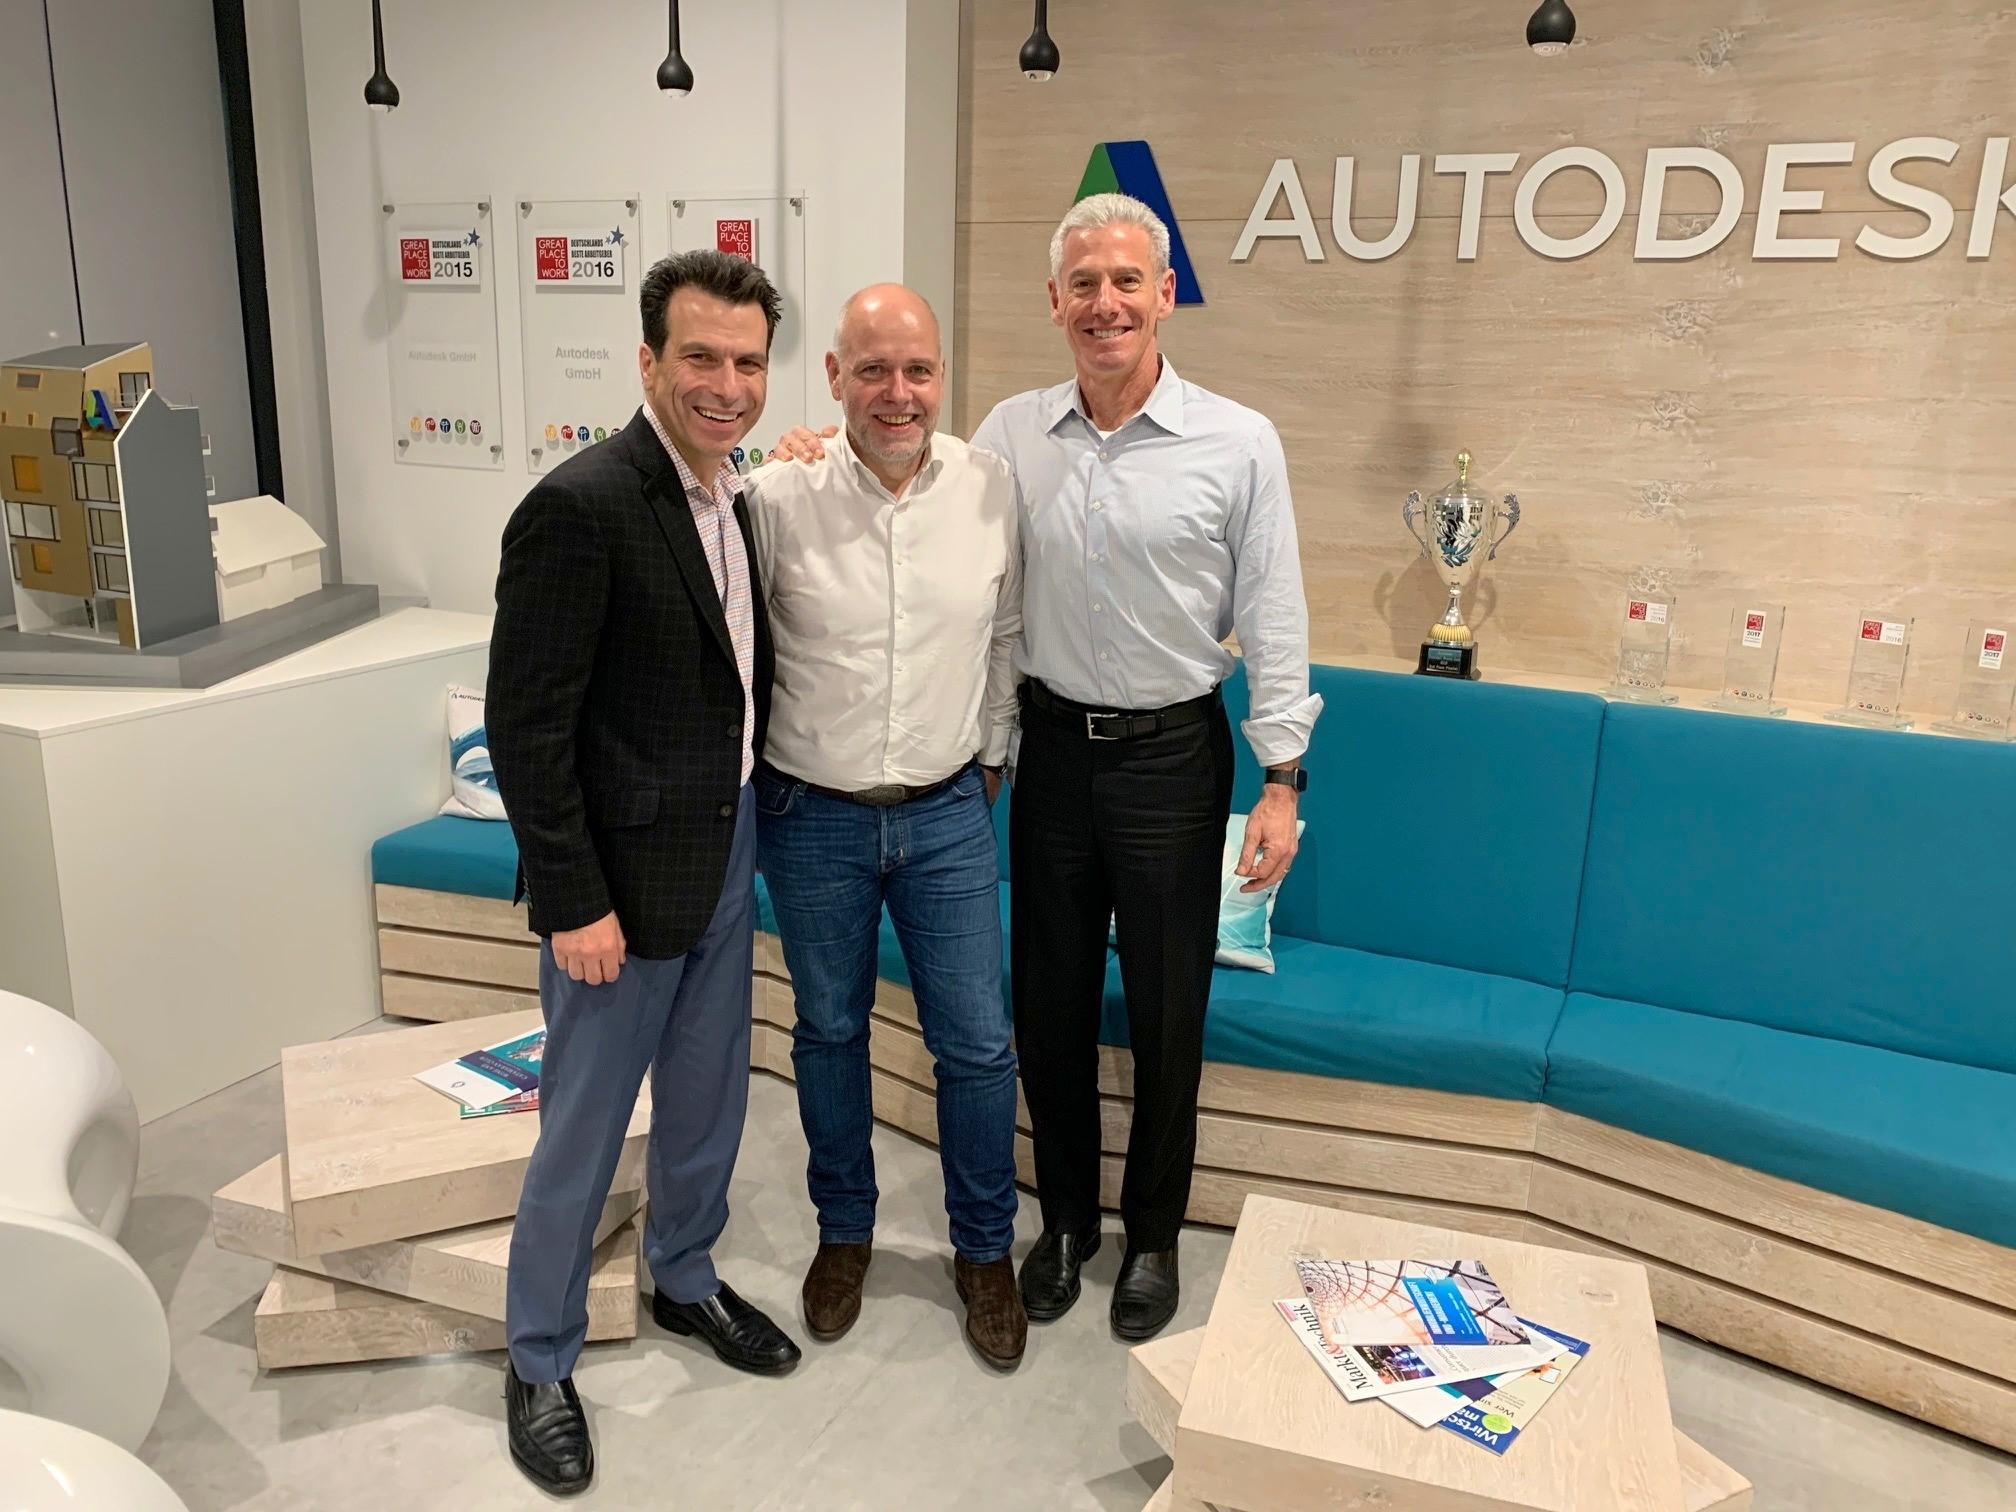 Andrew Anagnost, President and Chief Executive Officer Autodesk, Clemens Voegele, Geschäftsführer Cideon und Steve Blum, Senior Vice President Worldwide Field Operations, Autodesk.